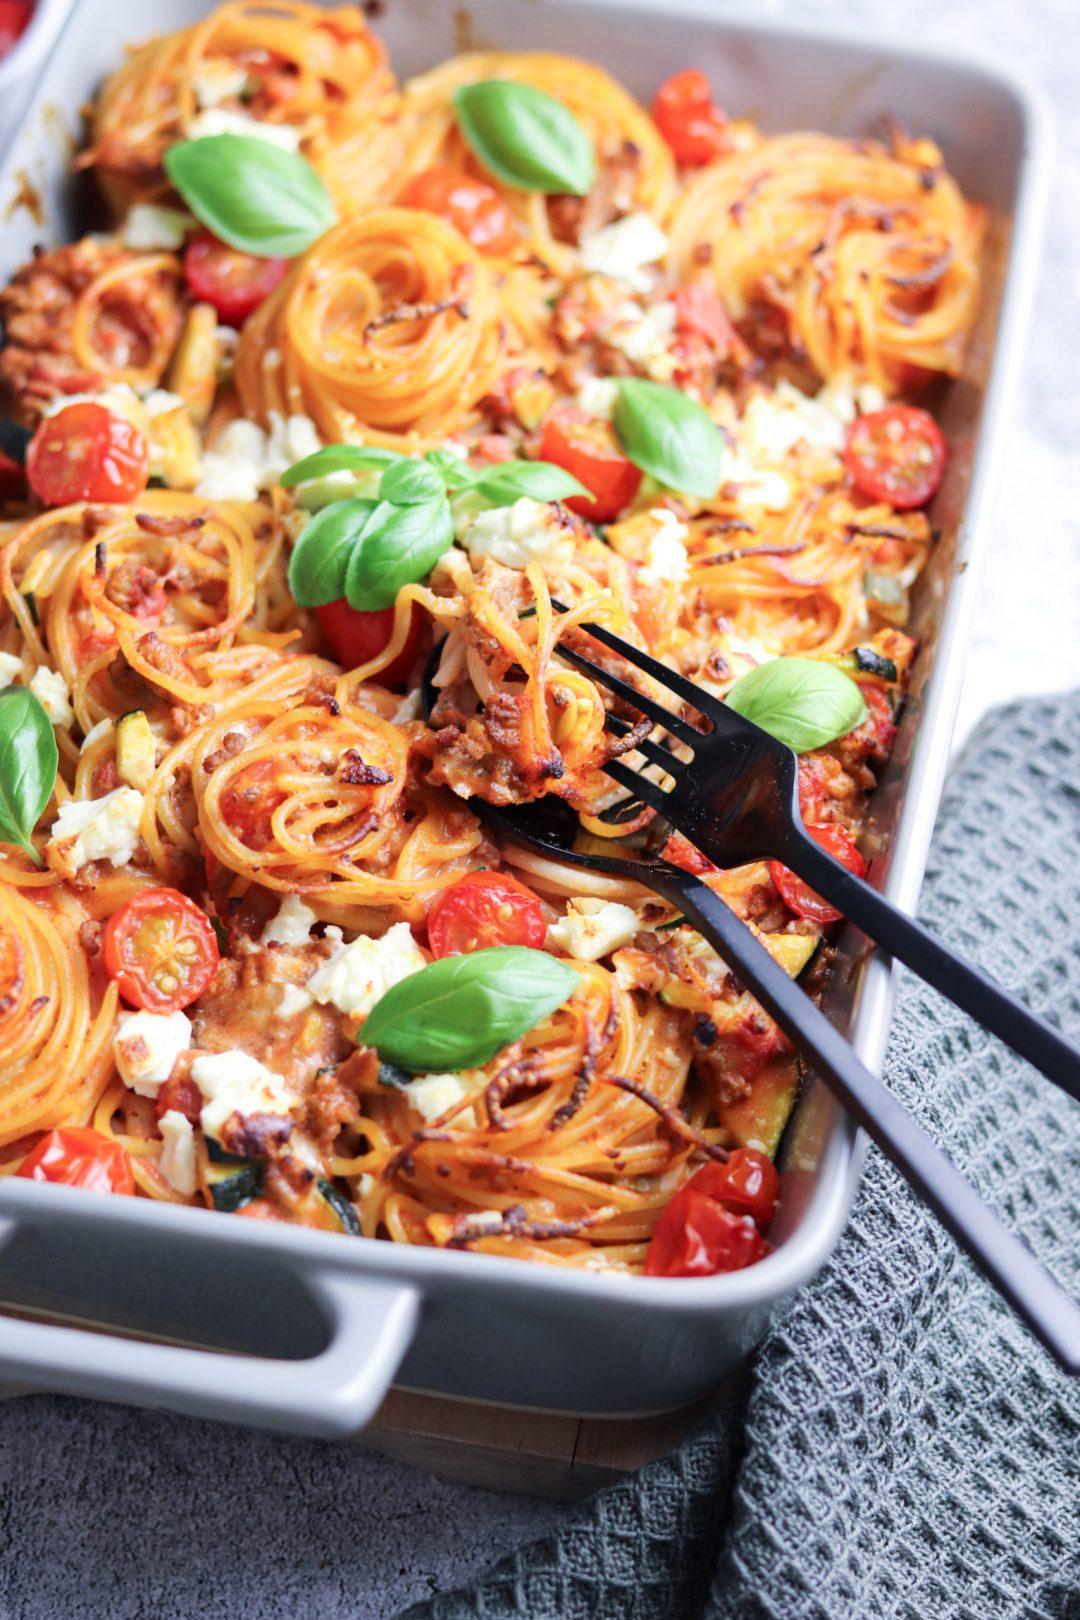 Spaghettiauflauf 2